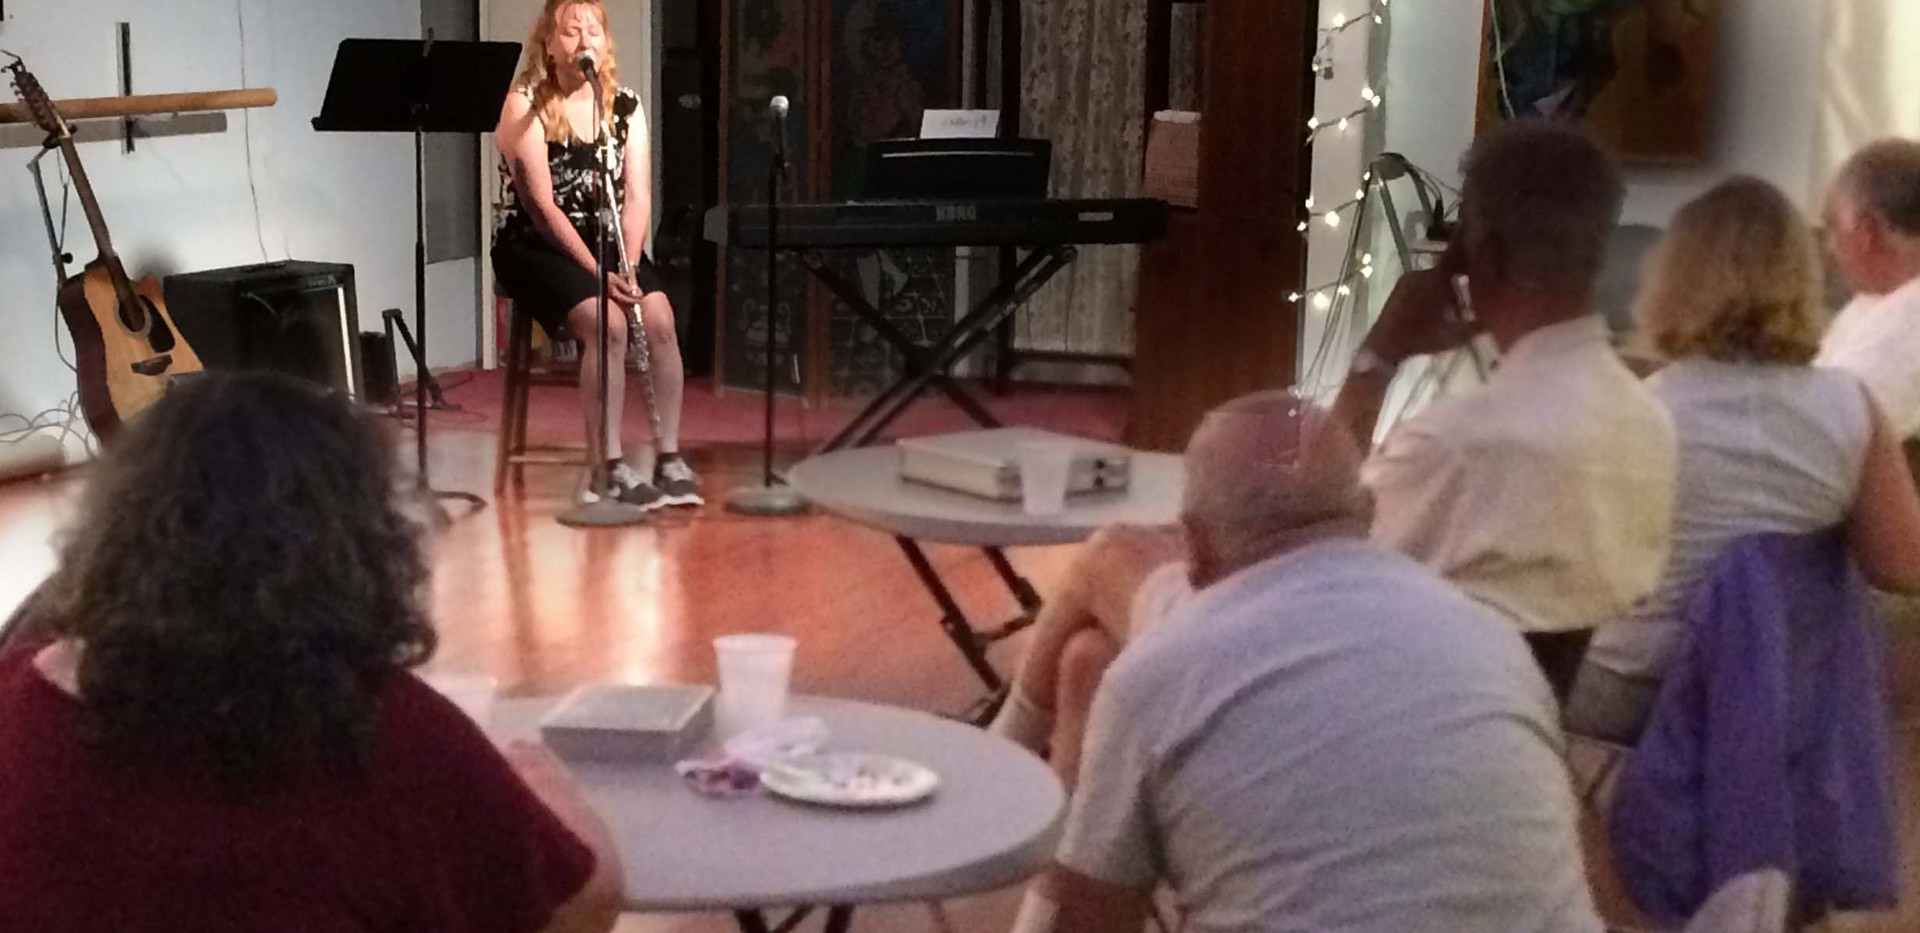 Julie doing storytelling at Open Mic night